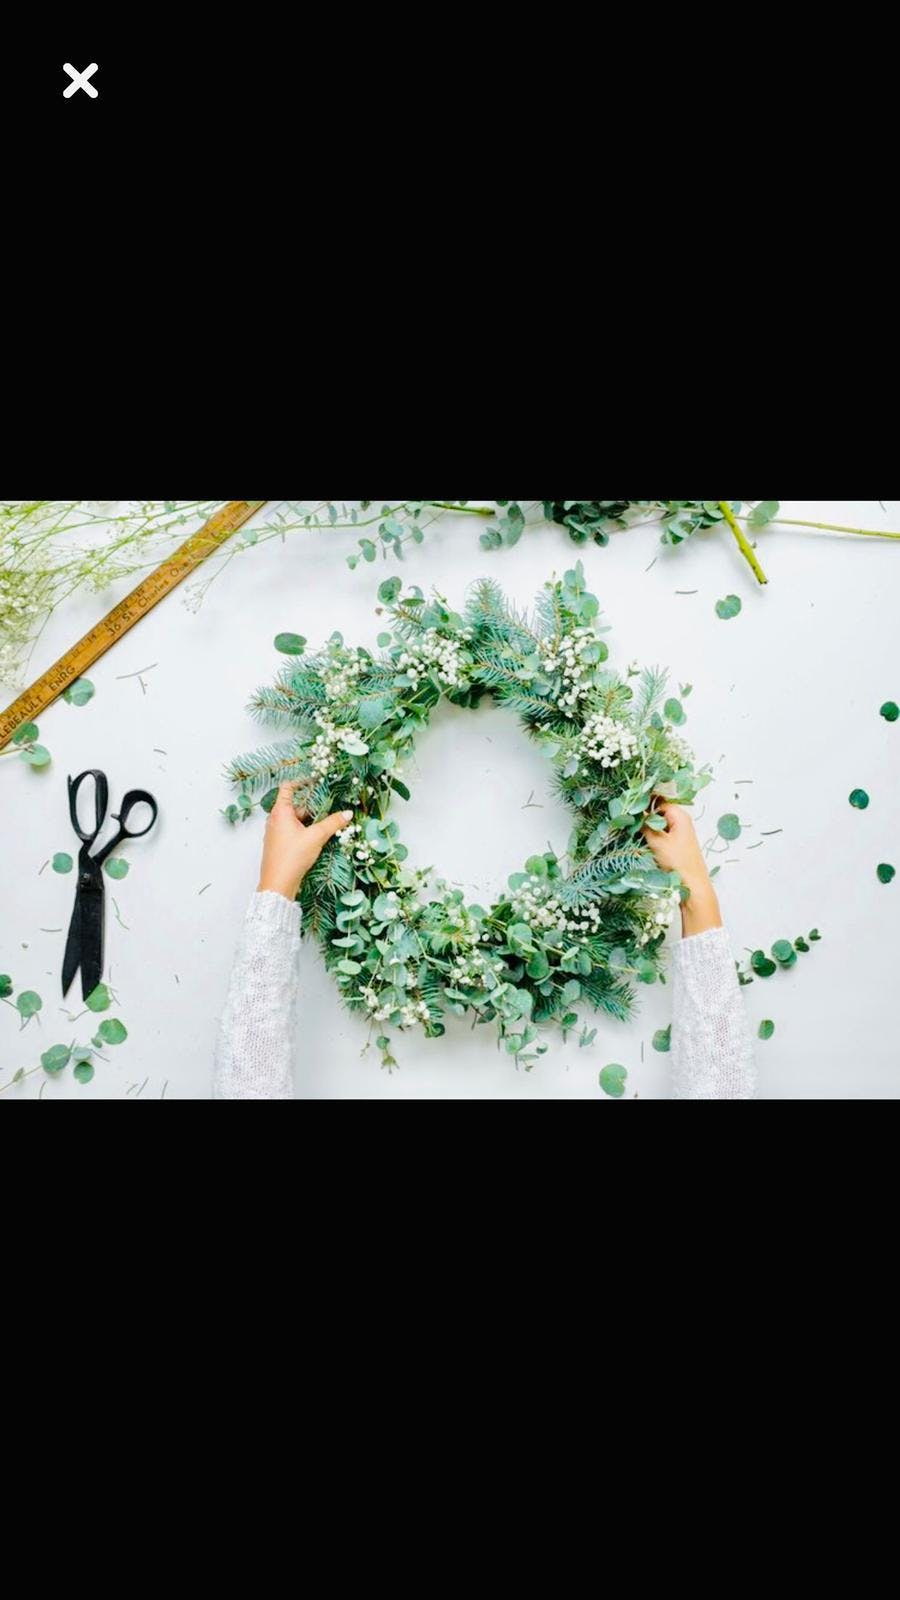 Festive Wreath Making Workshop - Evening sess